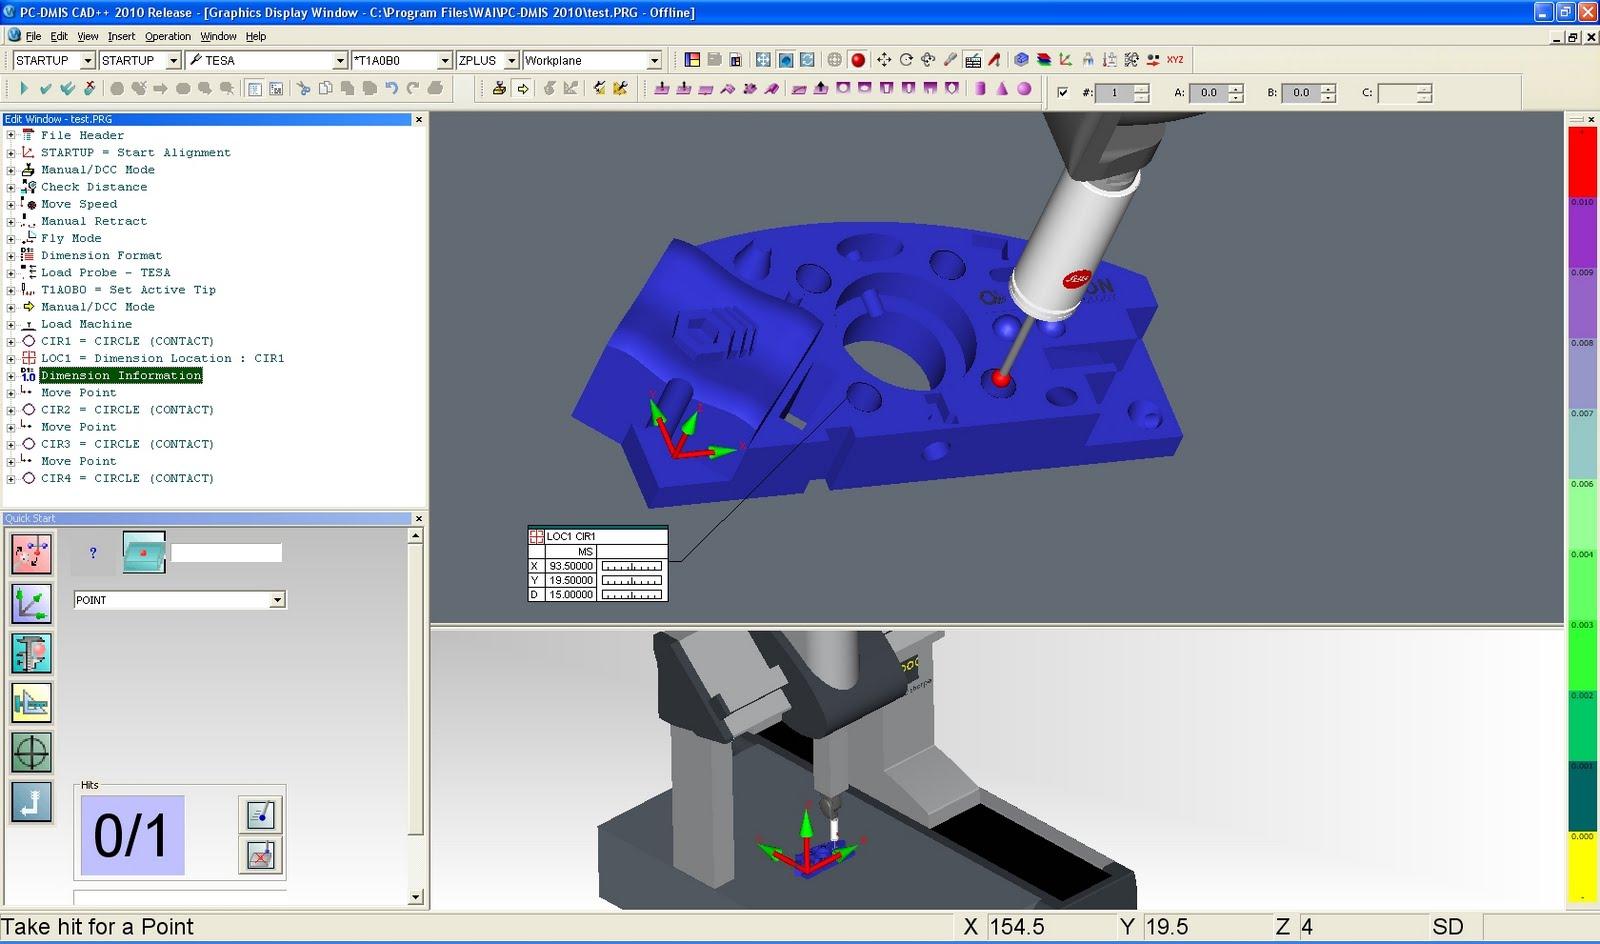 Hexagon Metrology Releases PC-DMIS 2010